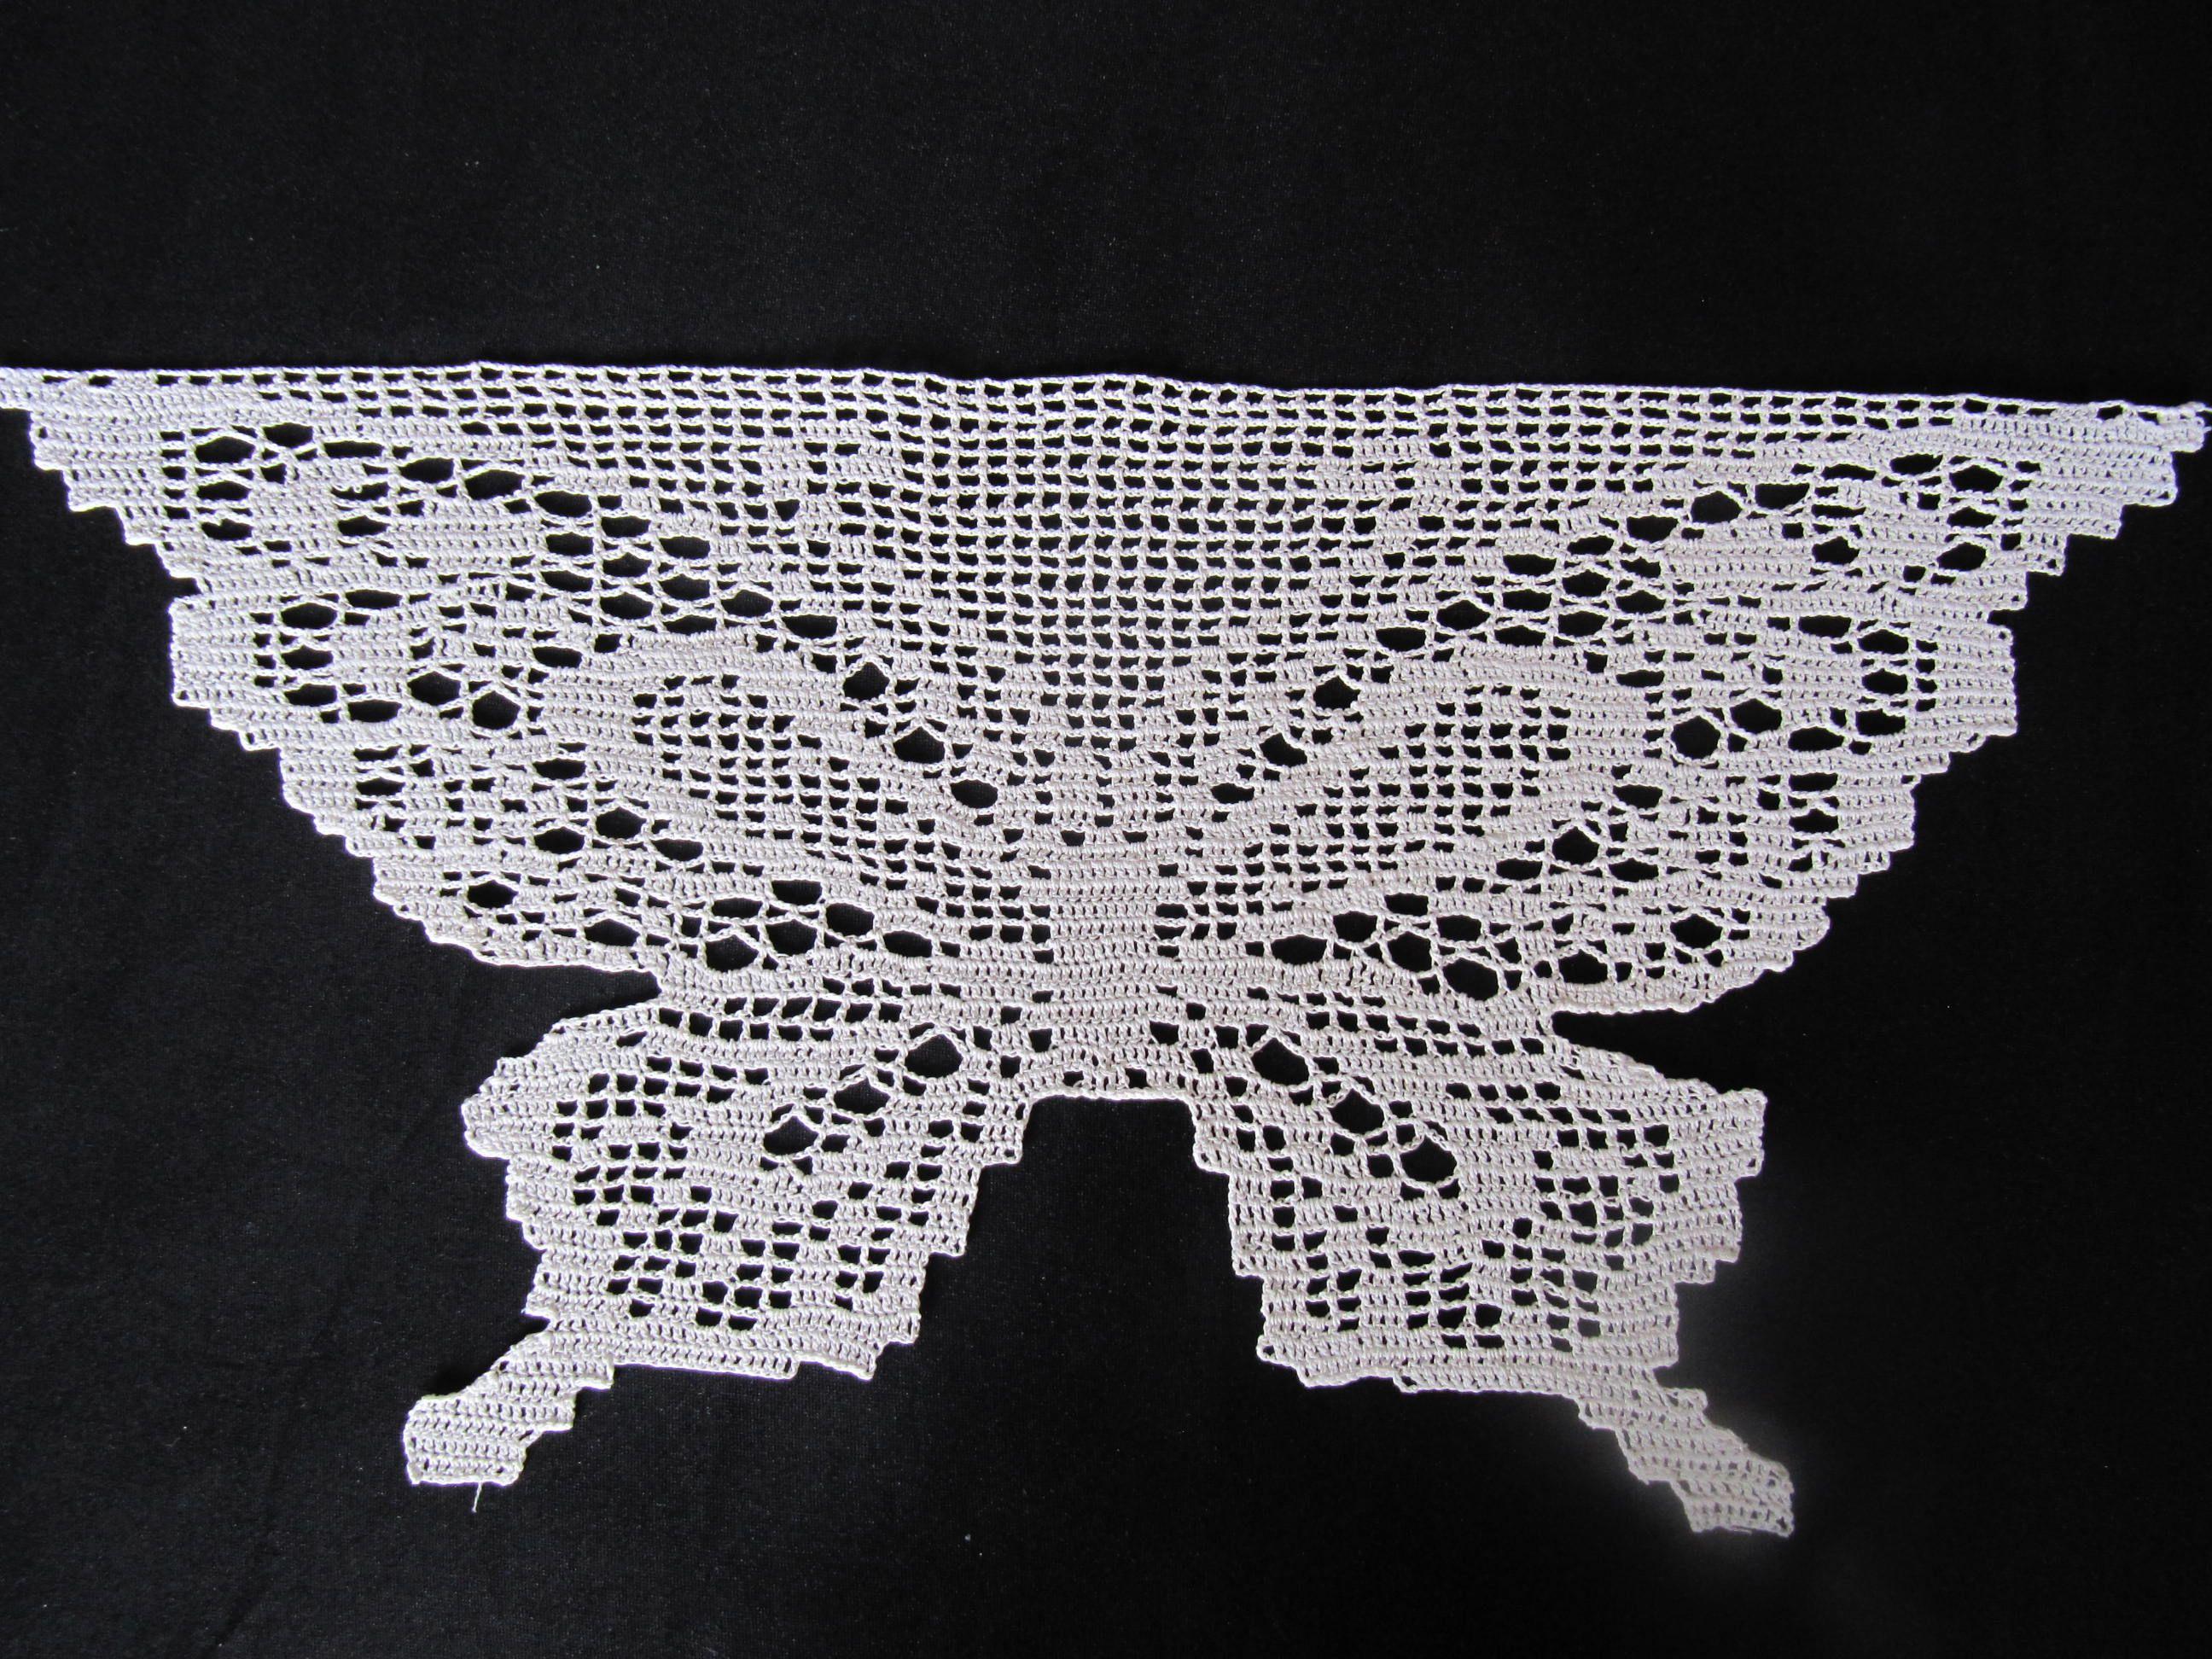 Filet crochet butterfly. Made from a Japanese pattern book | Crochet ...